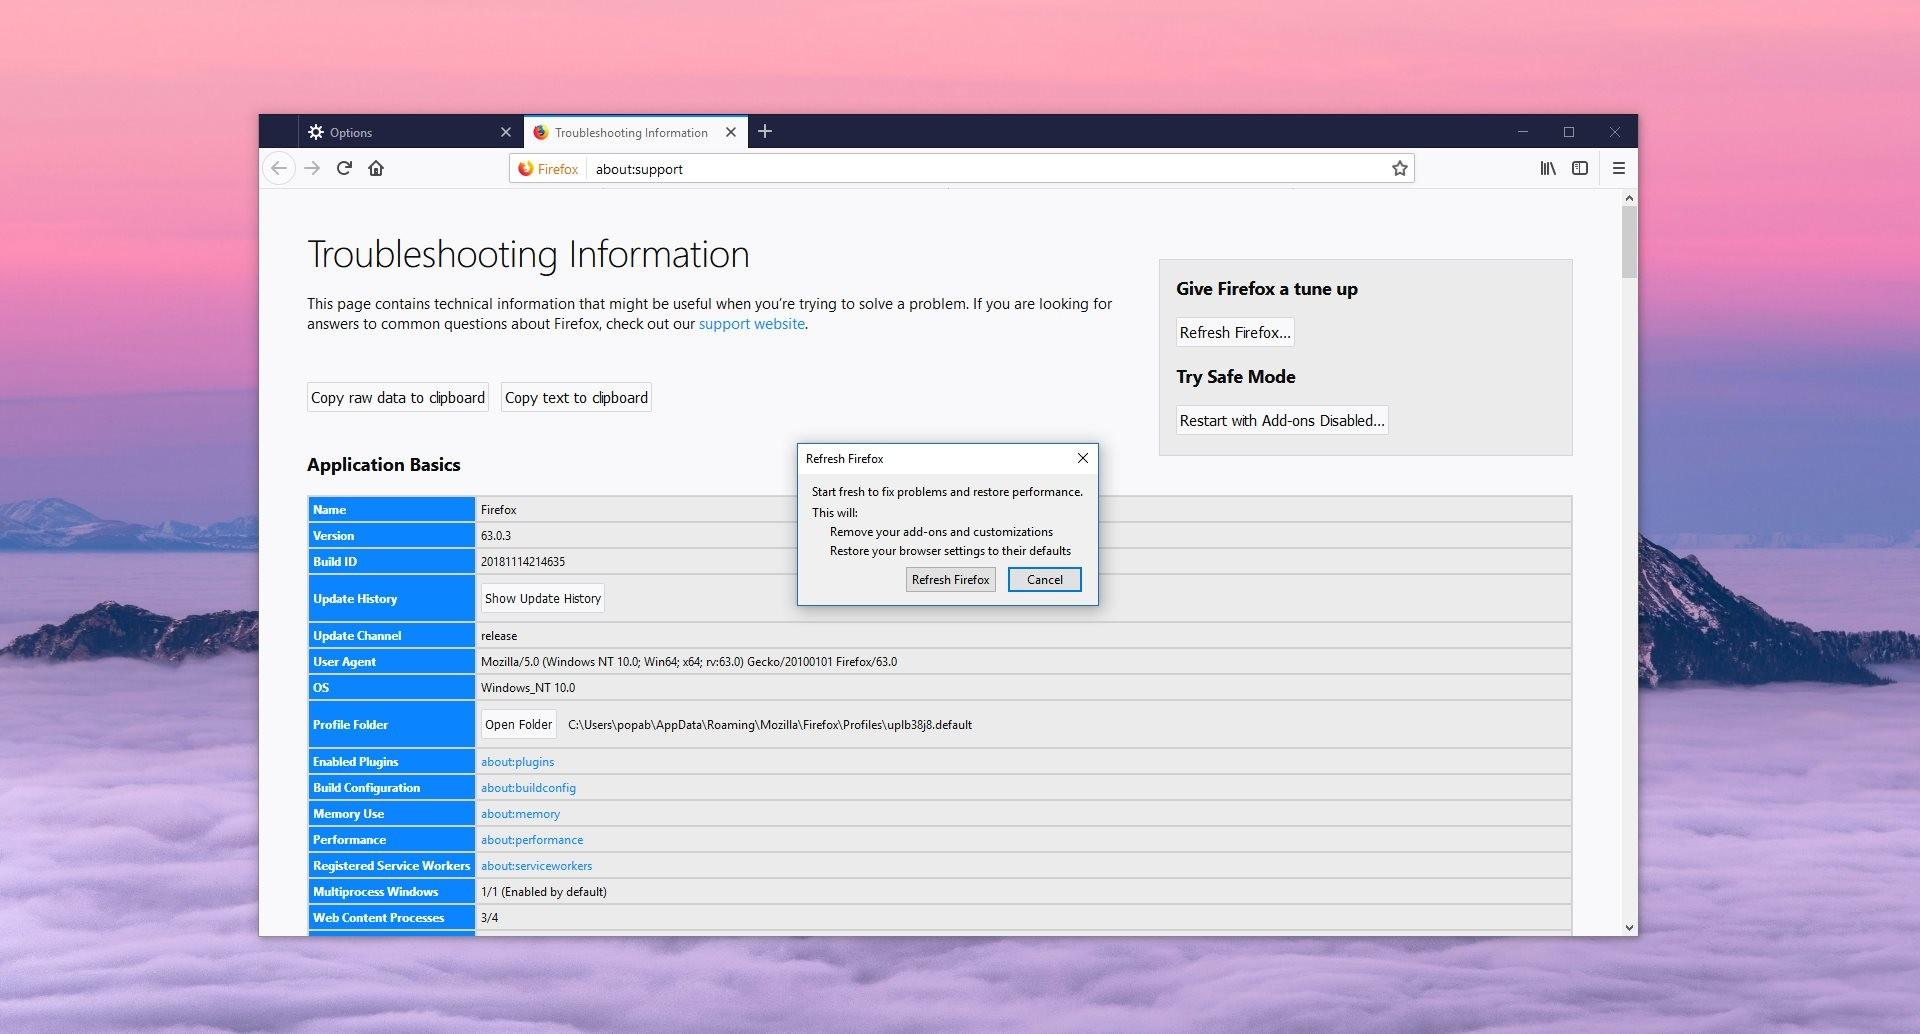 How to Reset Google Chrome, Microsoft Edge, and Mozilla Firefox